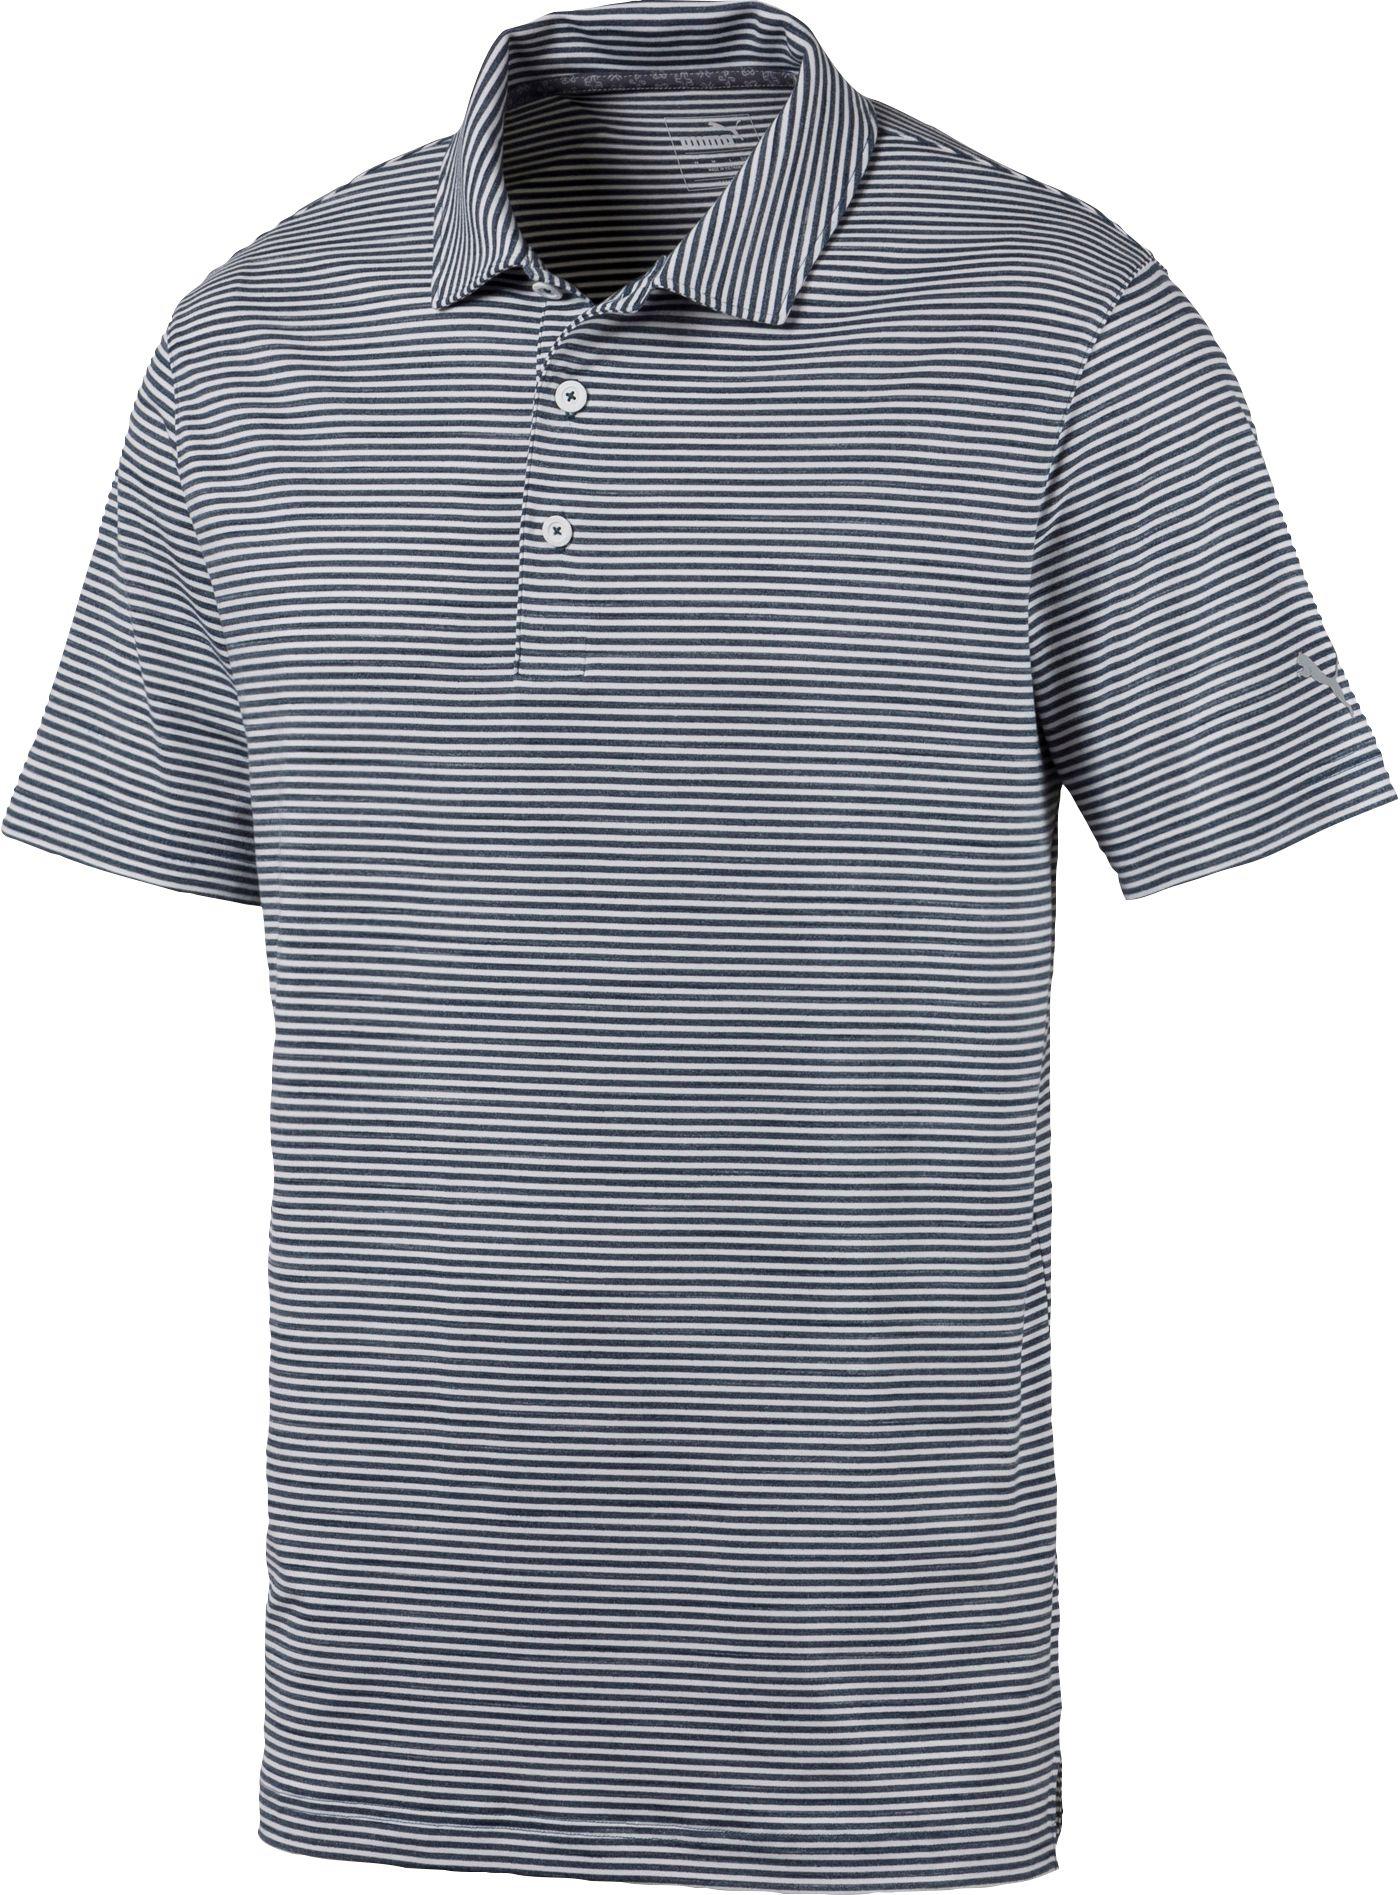 PUMA Men's Caddie Stripe Golf Polo